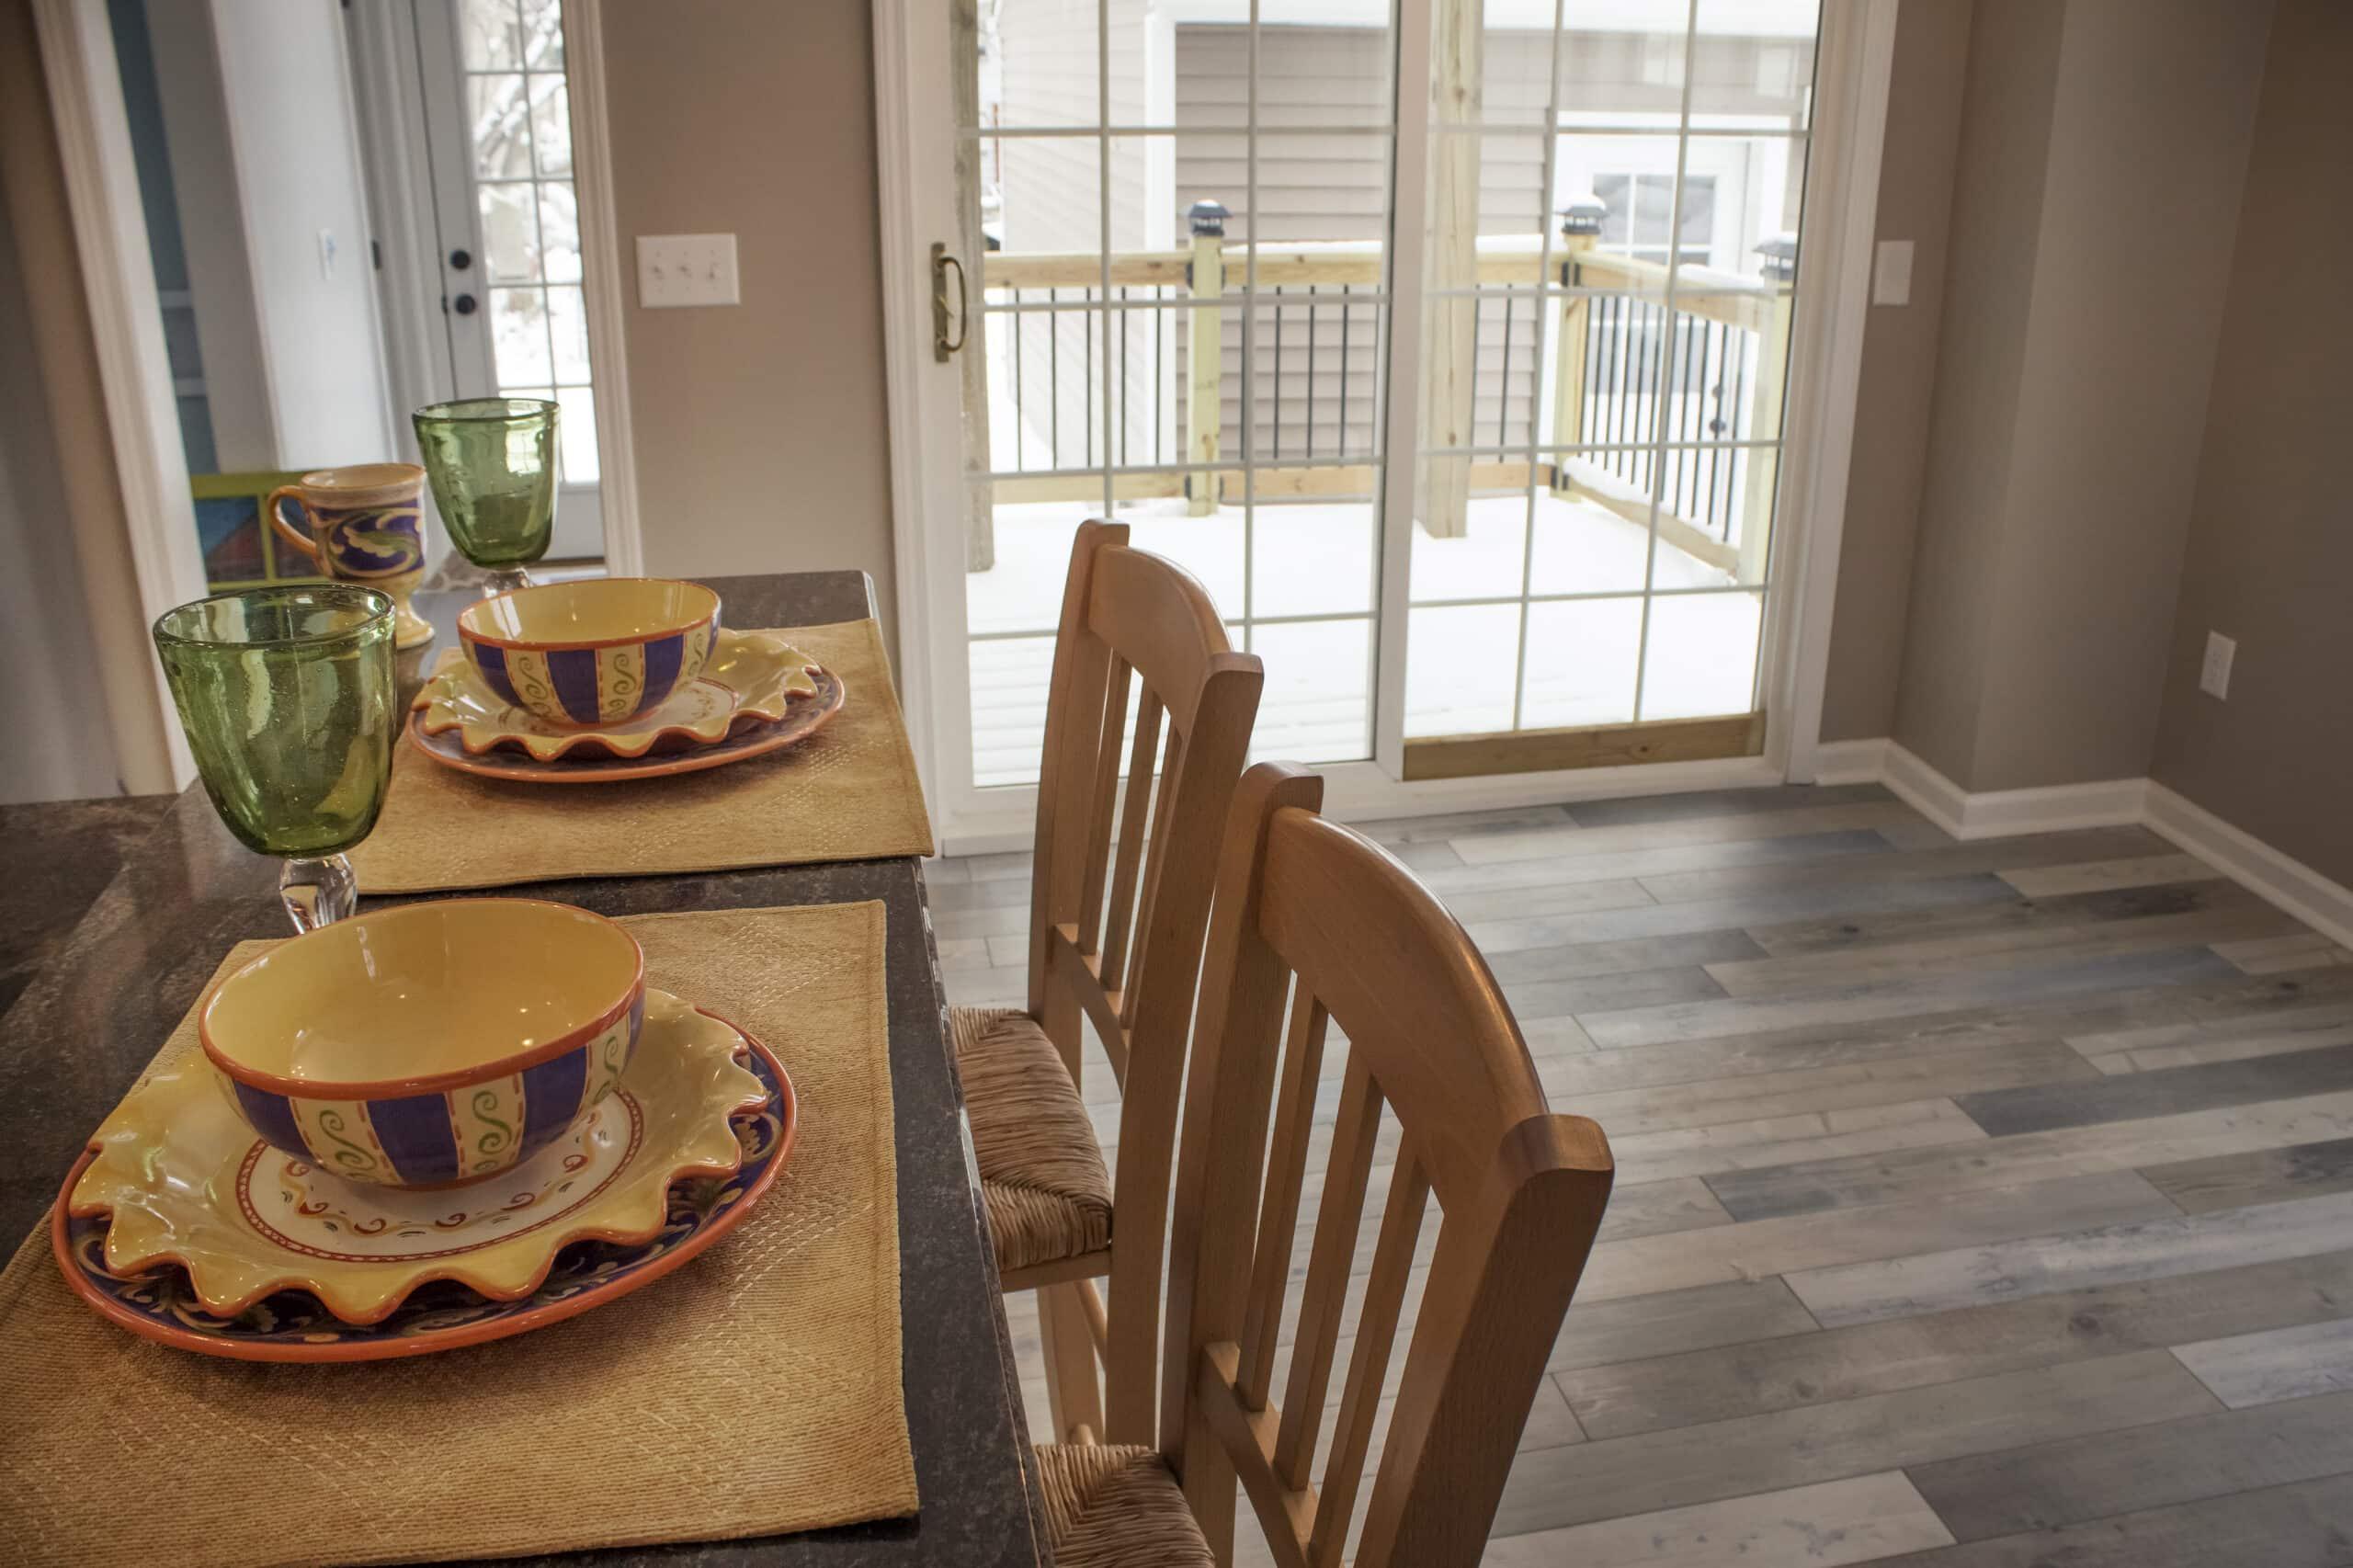 Coastal House Flip with Armstrong Relcaimed Laminate Floors